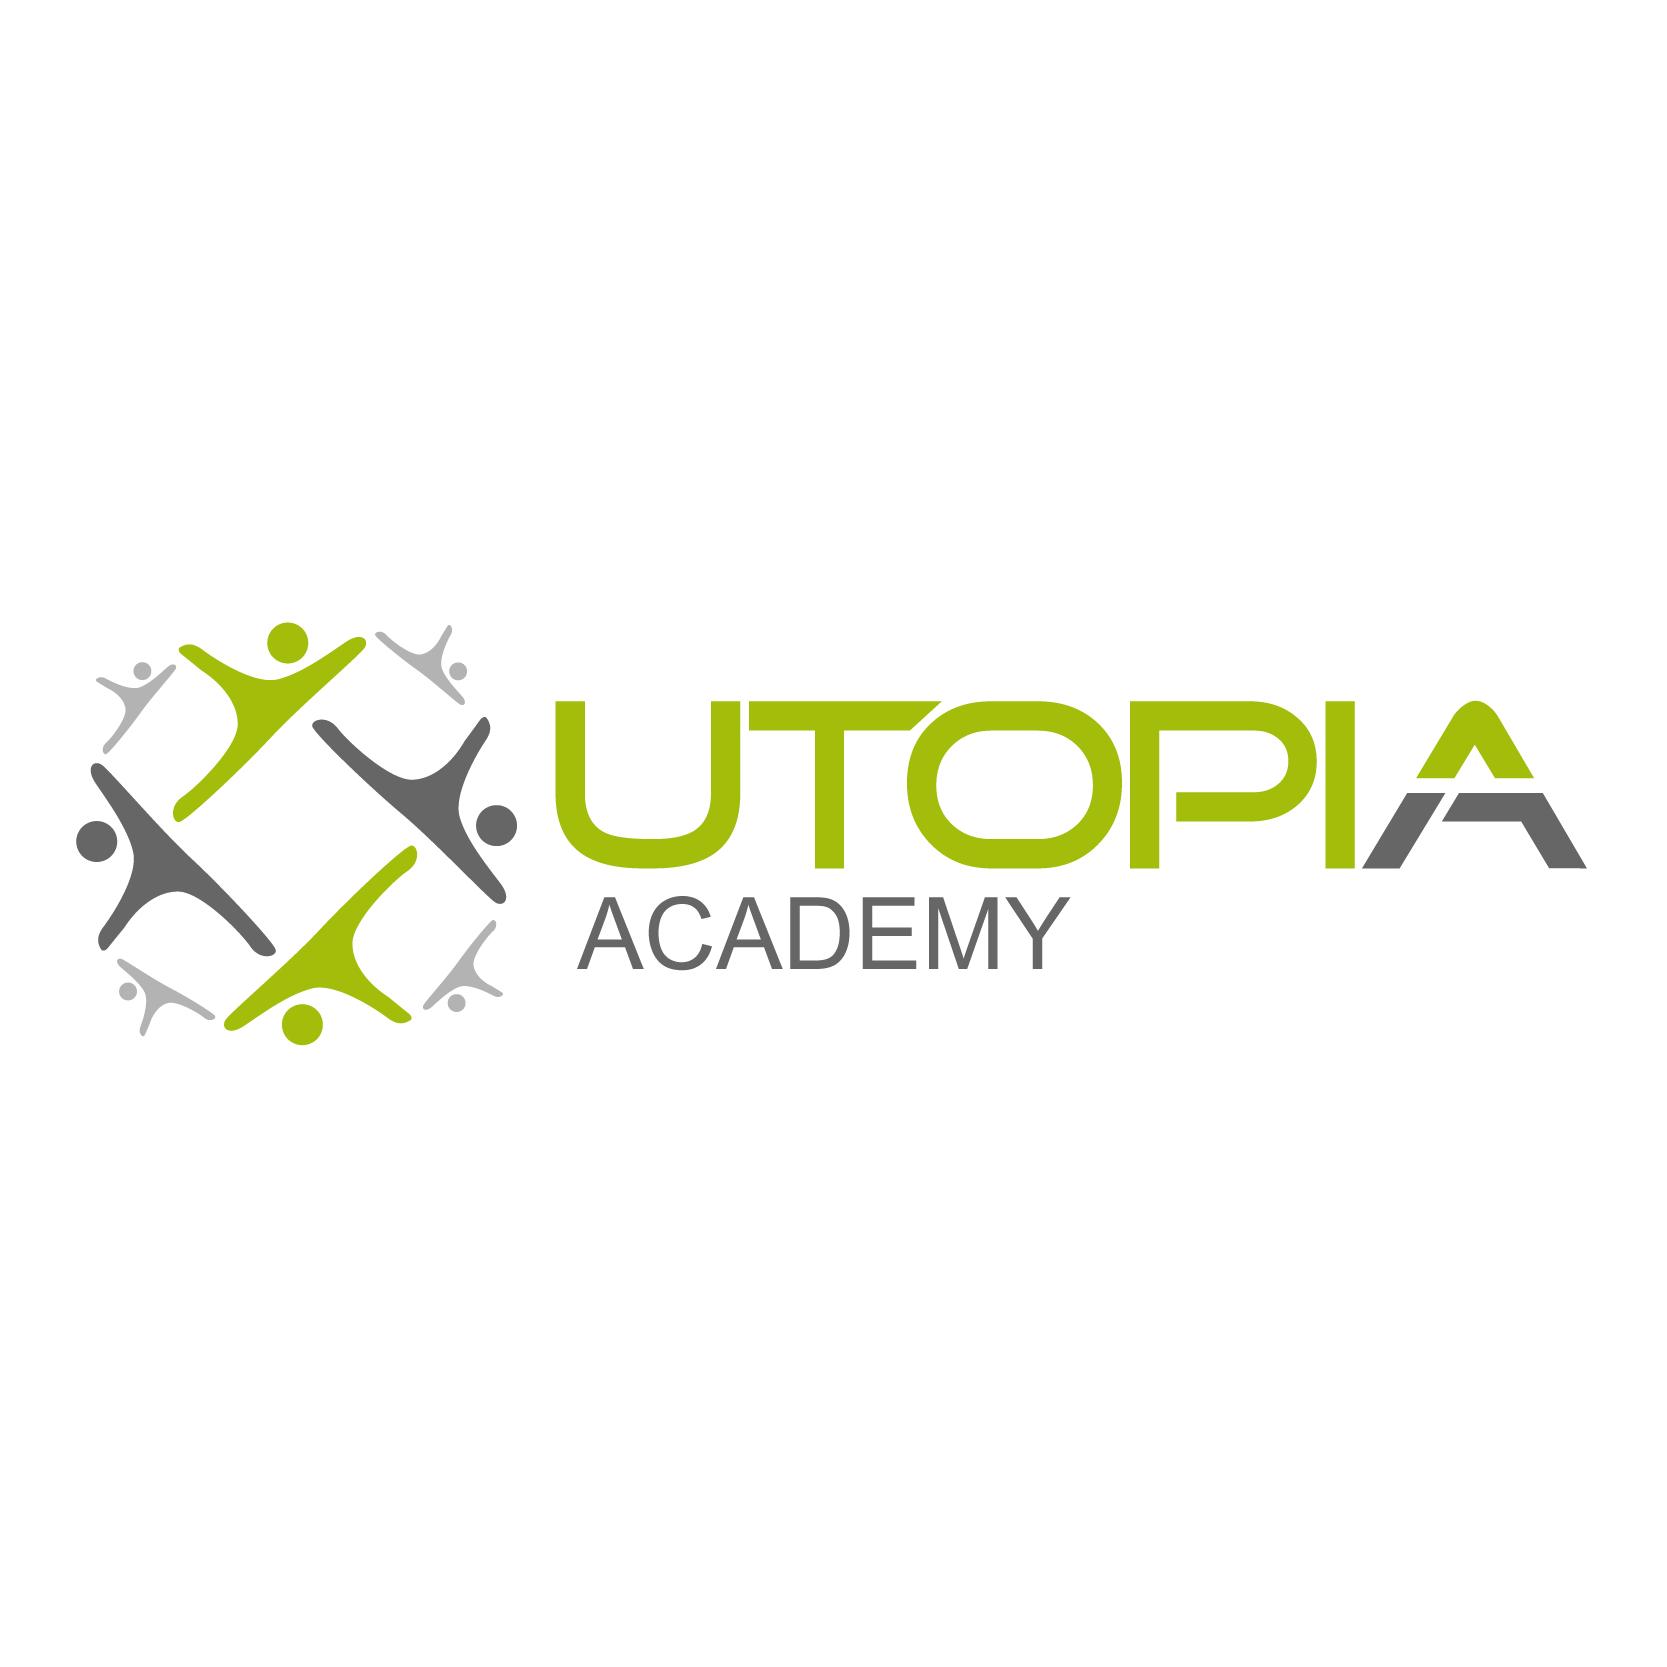 utopian school Phone number, address, website, statistics, and other information for utopia school, a public high school located in utopia, tx.